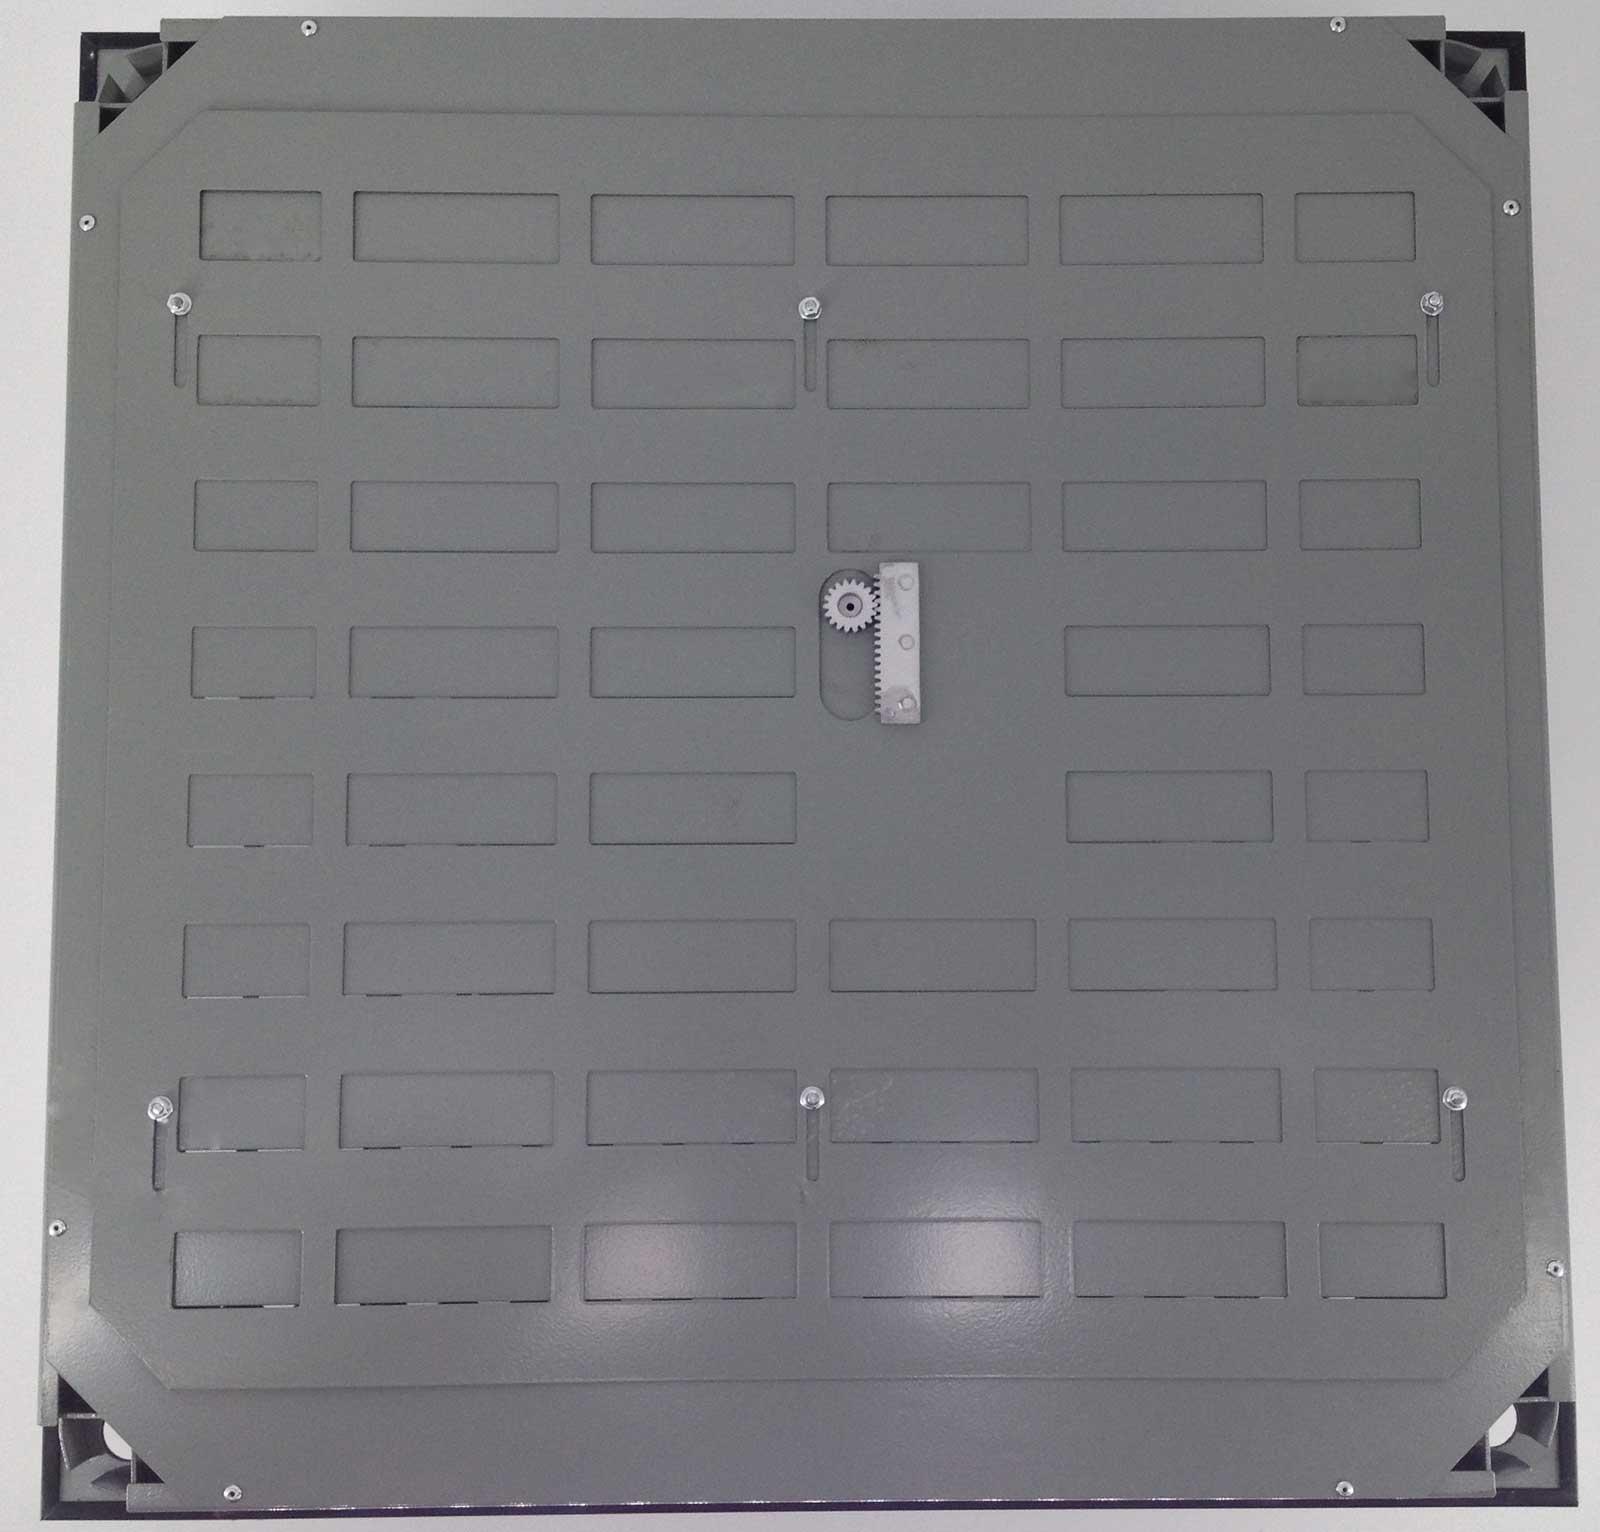 Raised Access Flooring Perforated Hpl Panel 3